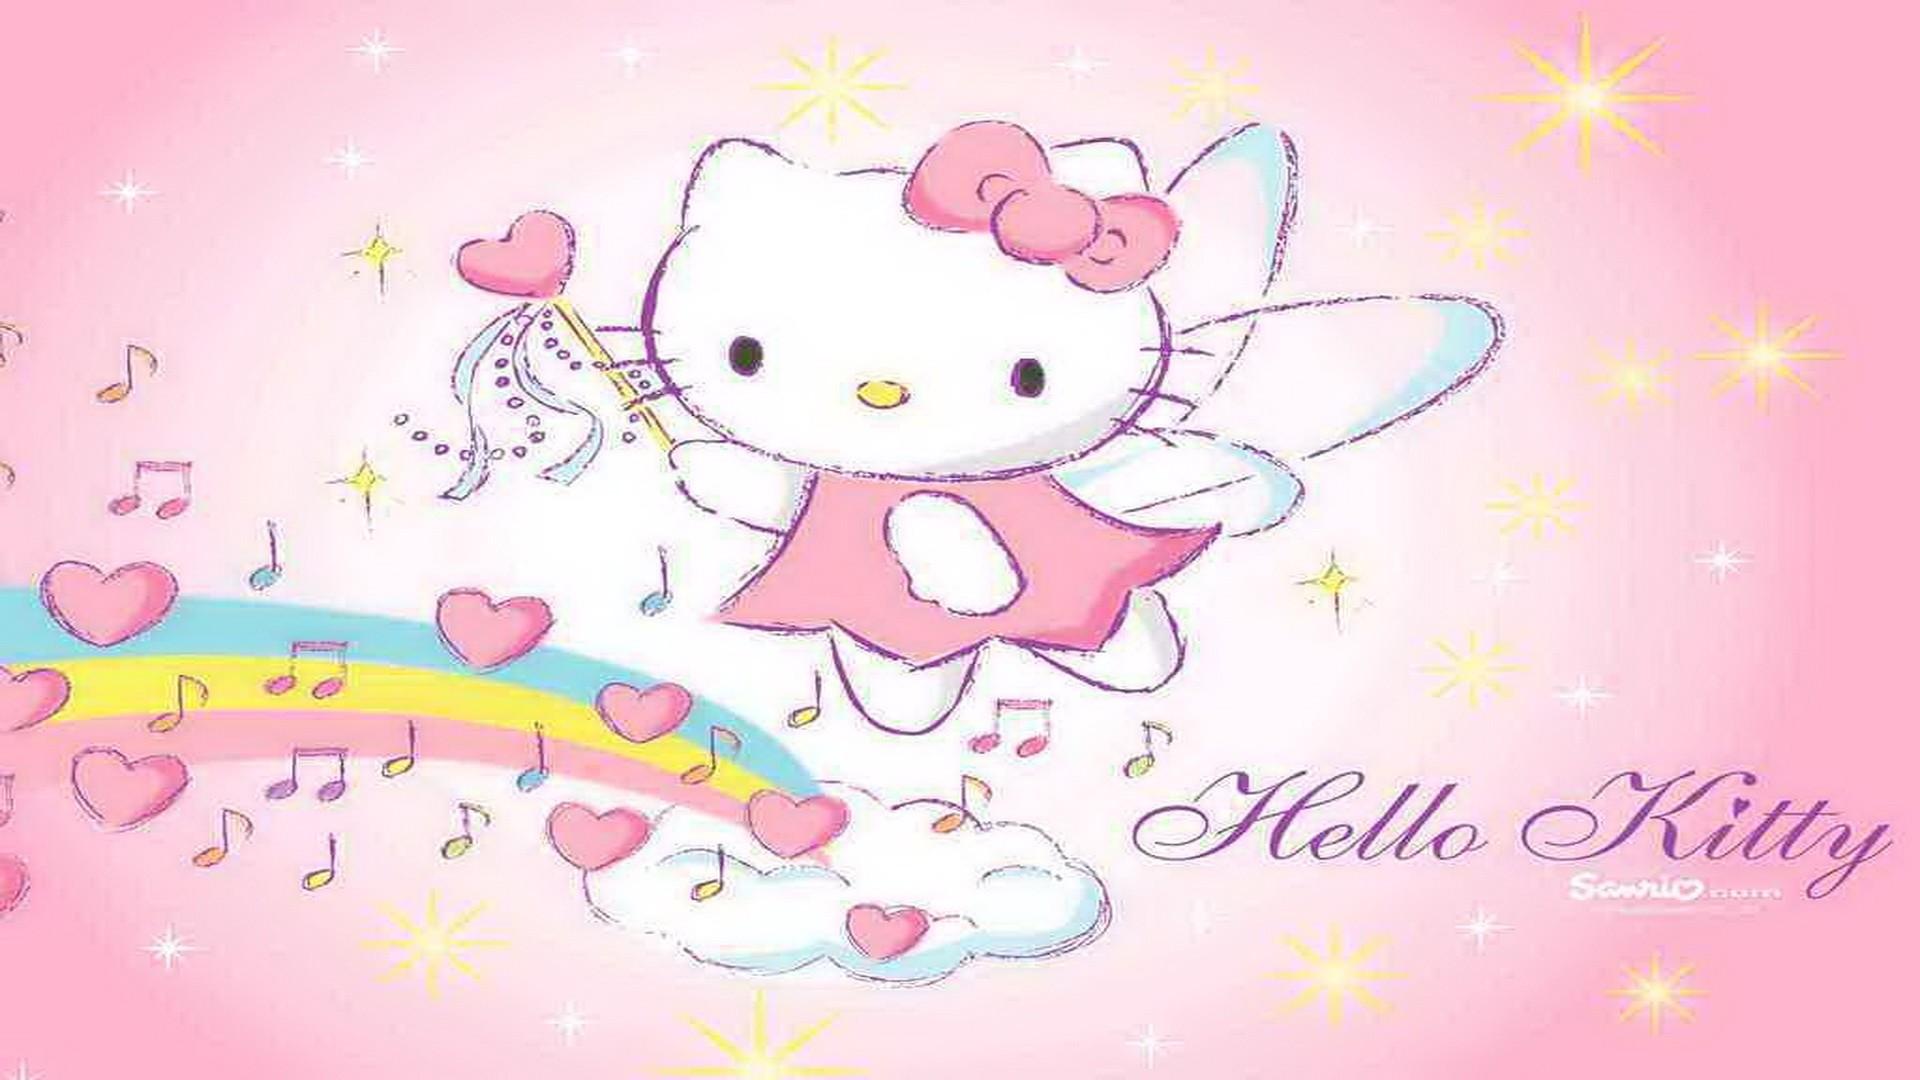 Good Wallpaper Hello Kitty Galaxy - 968695-large-hd-wallpaper-hello-kitty-1920x1080-for-windows  Collection_895265.jpg